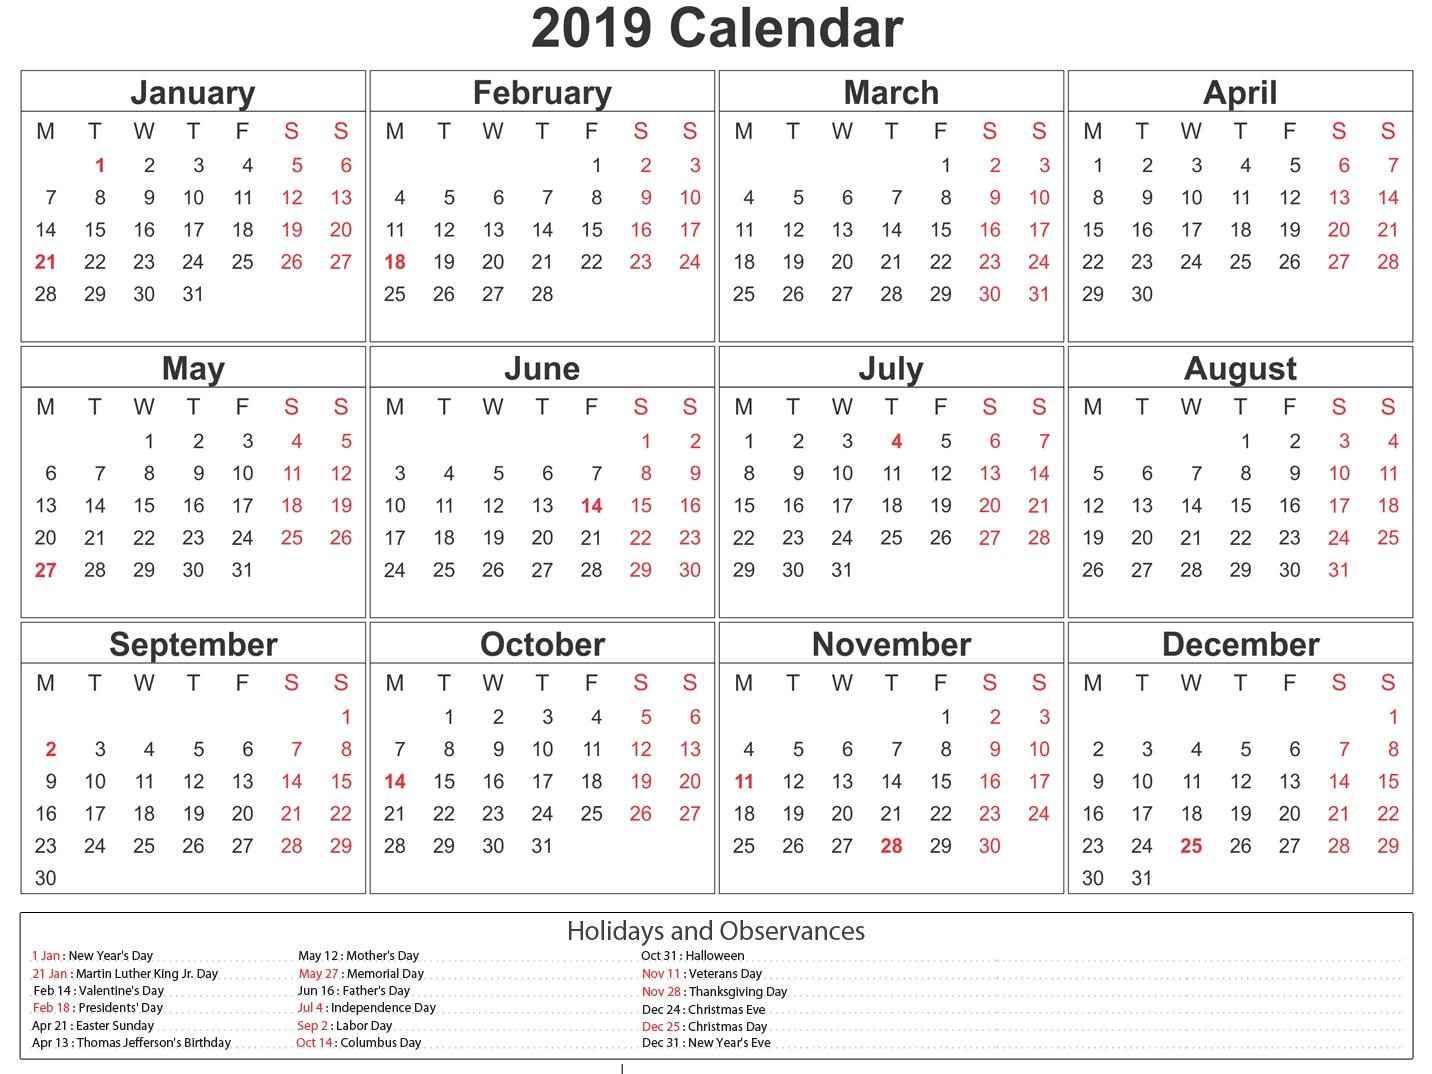 Printable South Africa 2019 Calendar #southafrica #calendar-January 2020 Calendar With Holidays South Africa